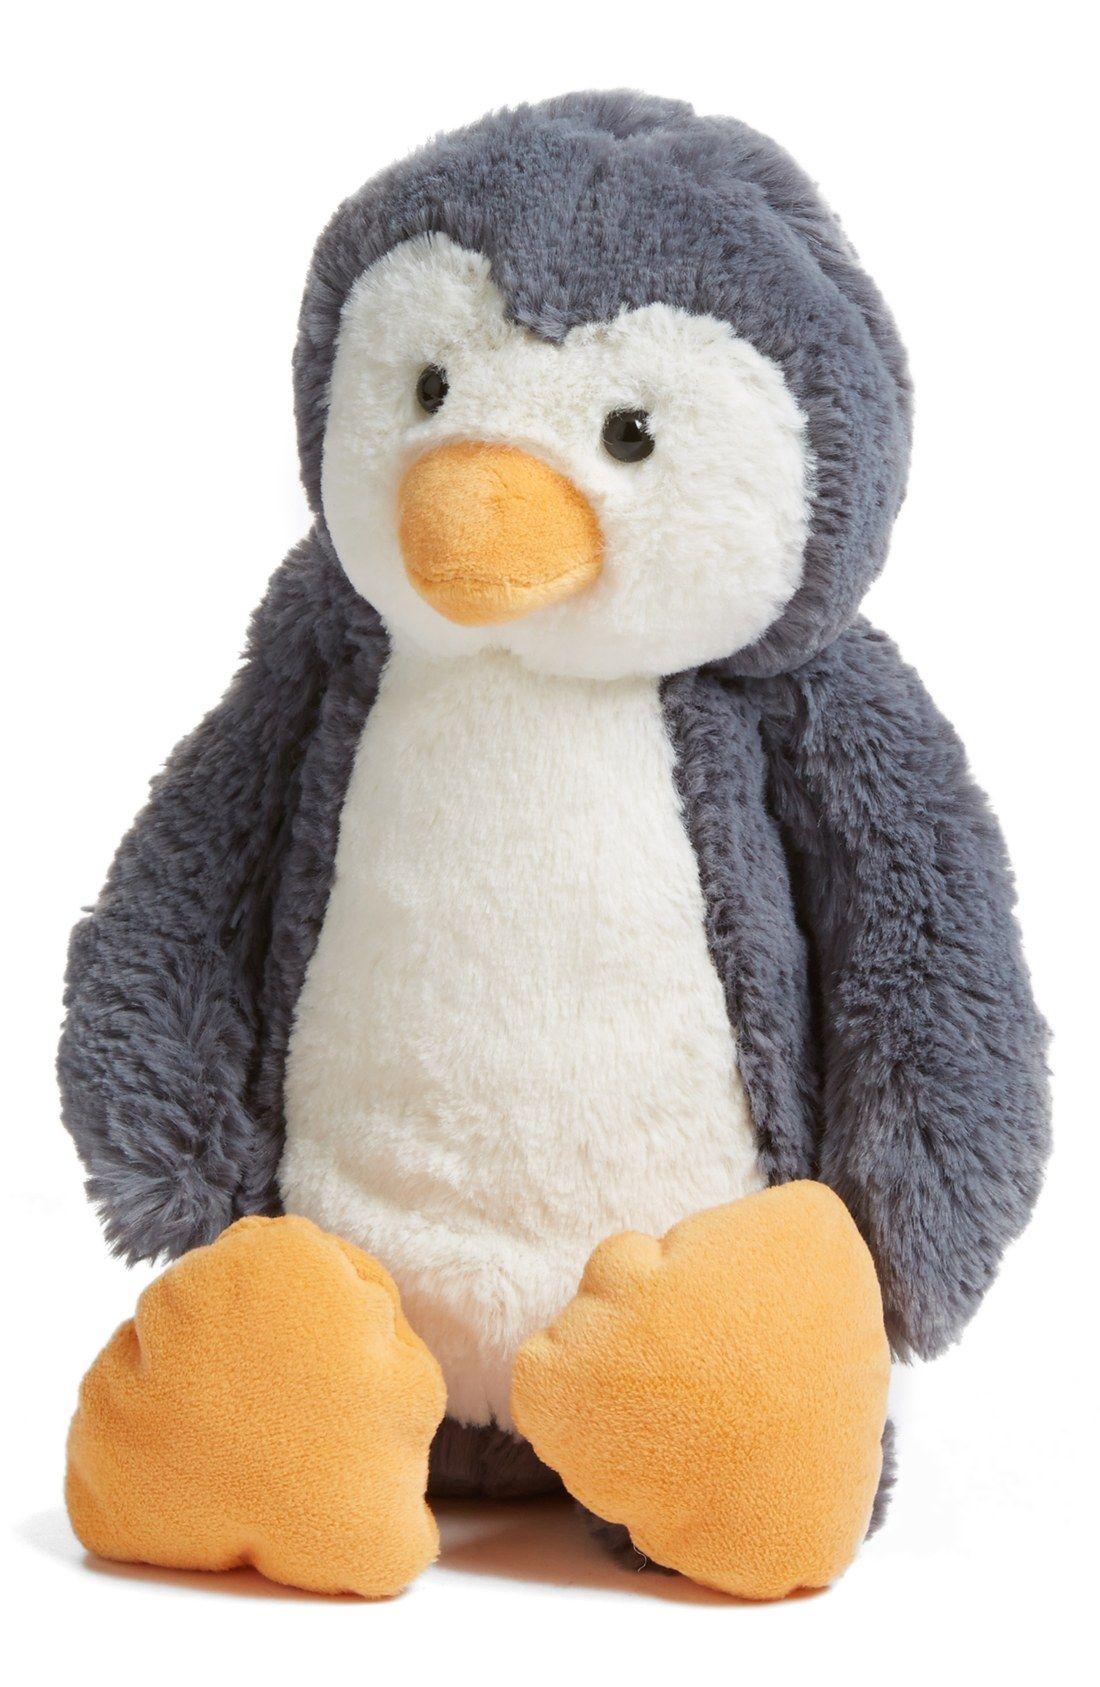 Jellycat 'Bashful Penguin' Stuffed Animal Jellycat